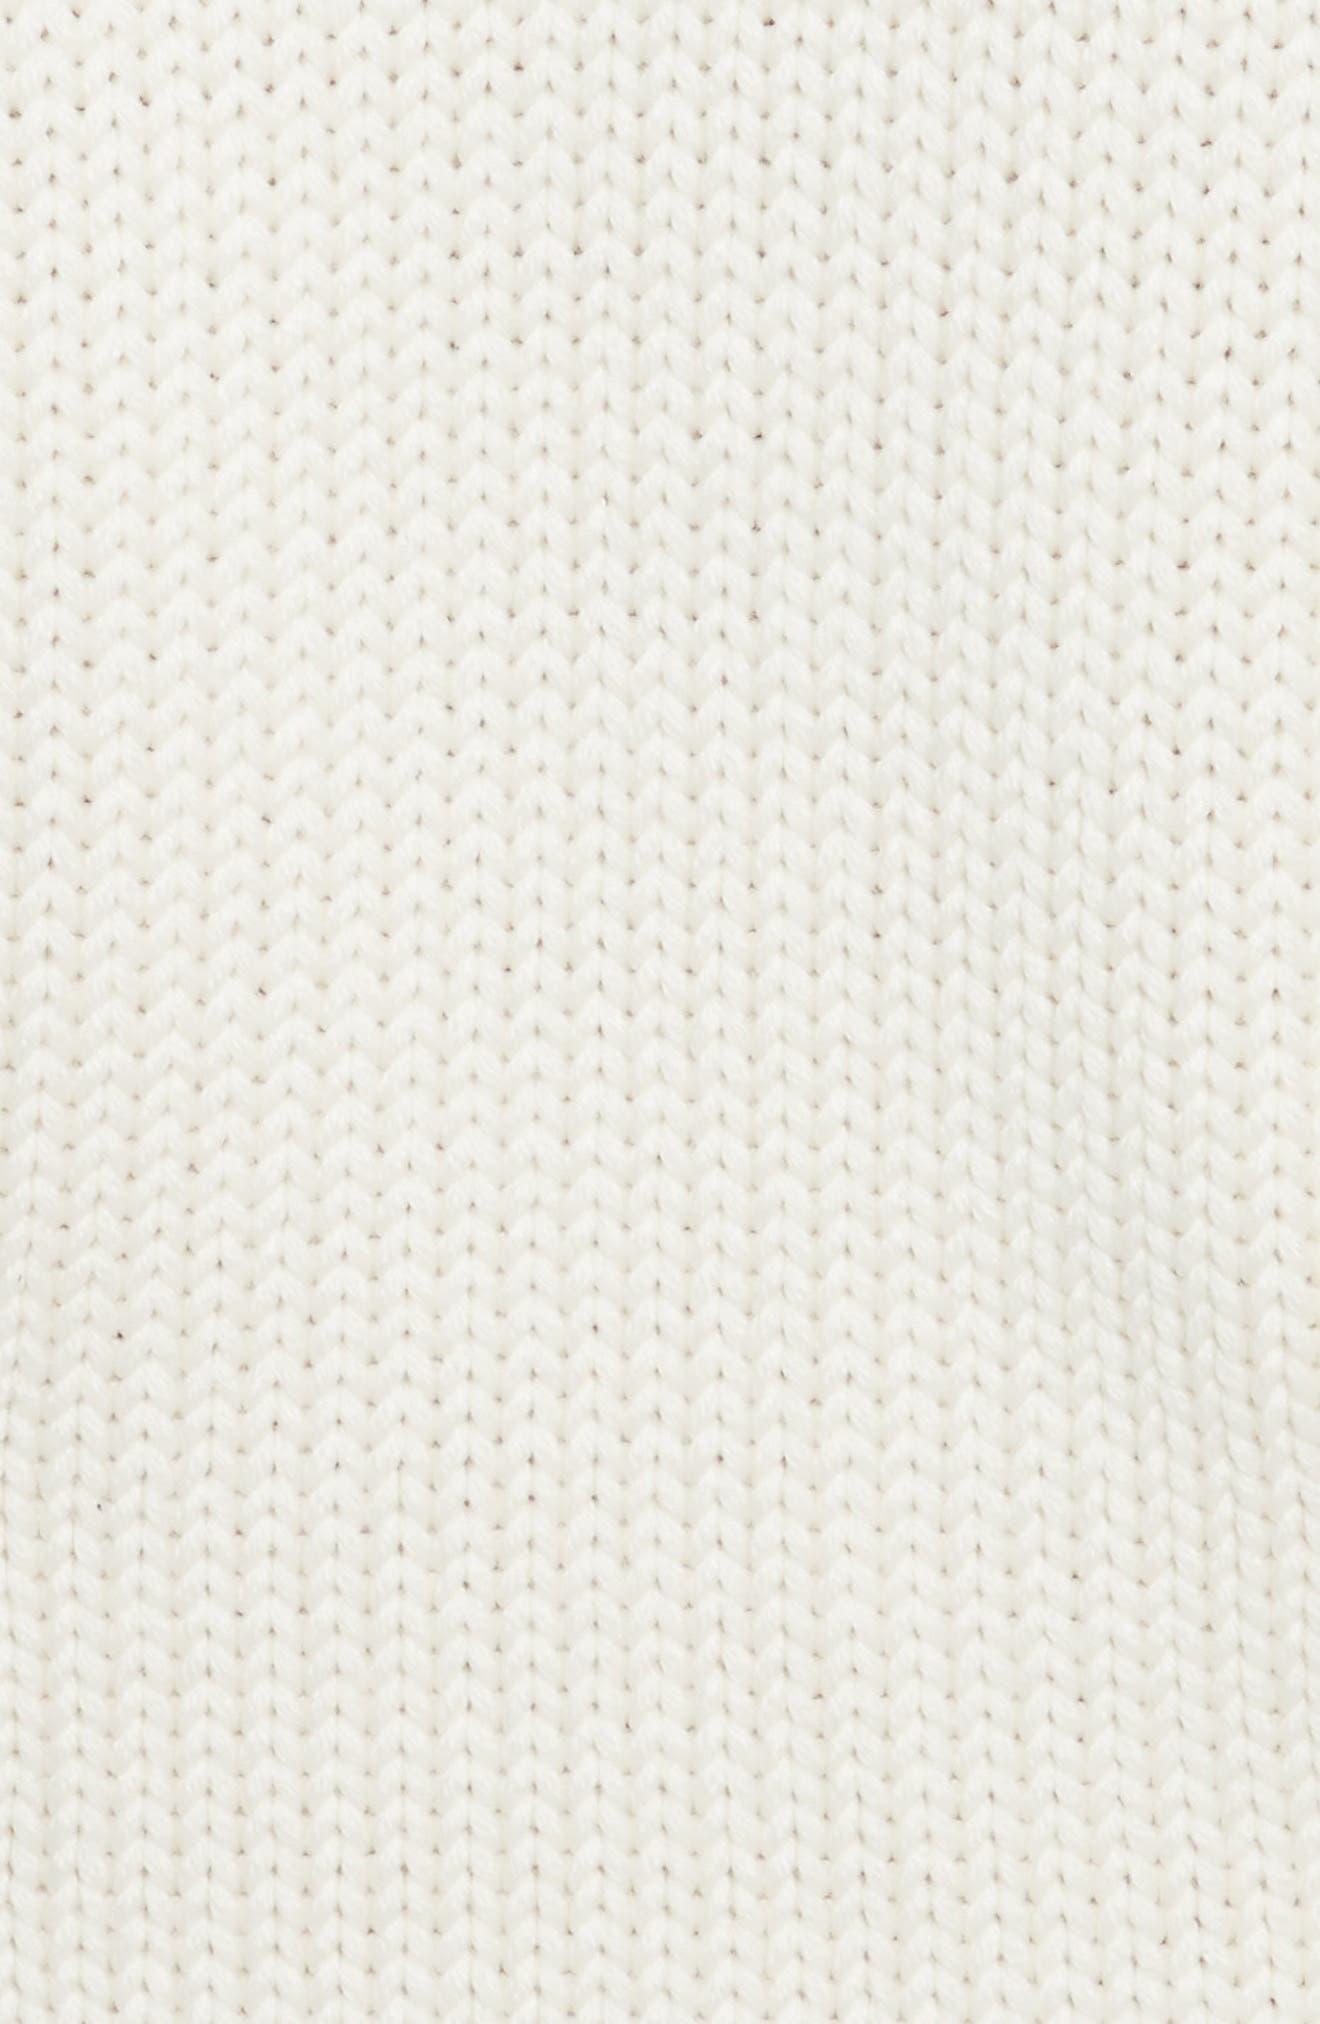 Lace-Up Turtleneck Sweater Dress,                             Alternate thumbnail 6, color,                             Ivory